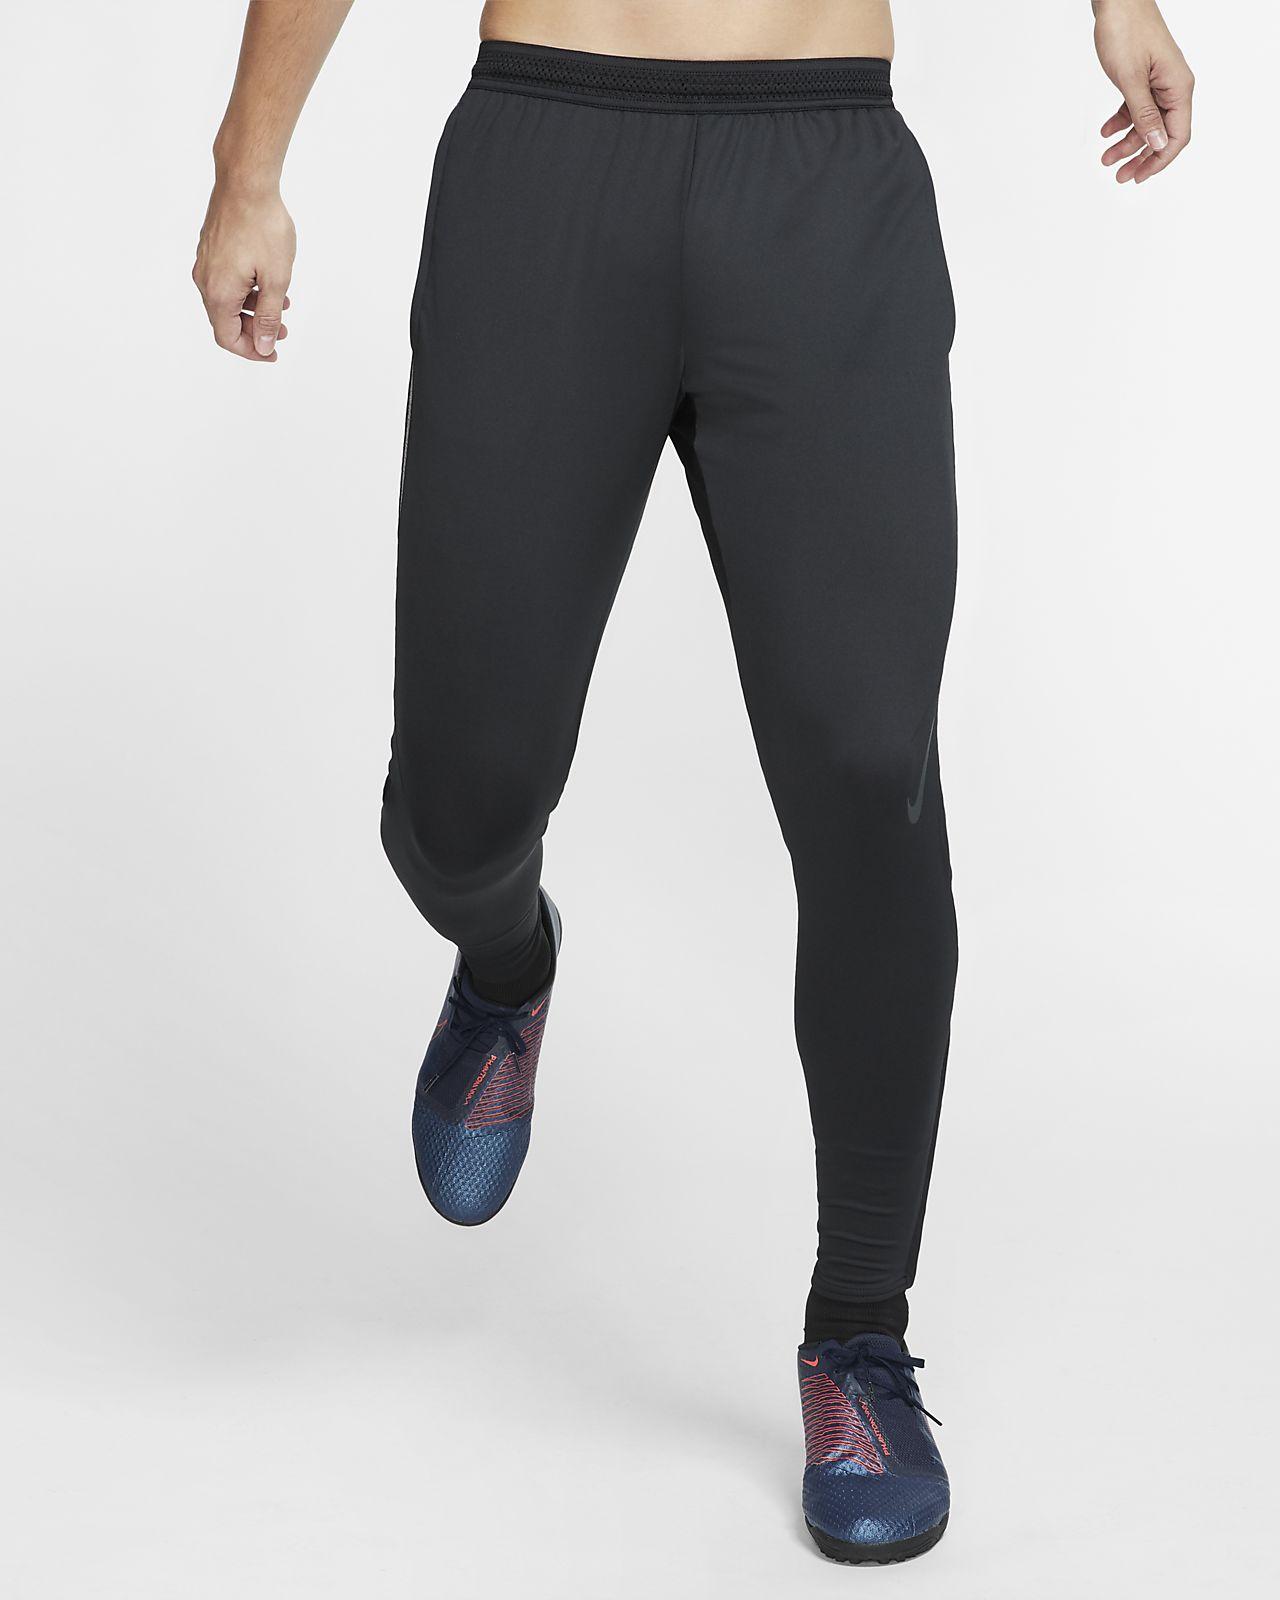 Nike Dri-FIT Strike Erkek Futbol Eşofman Altı